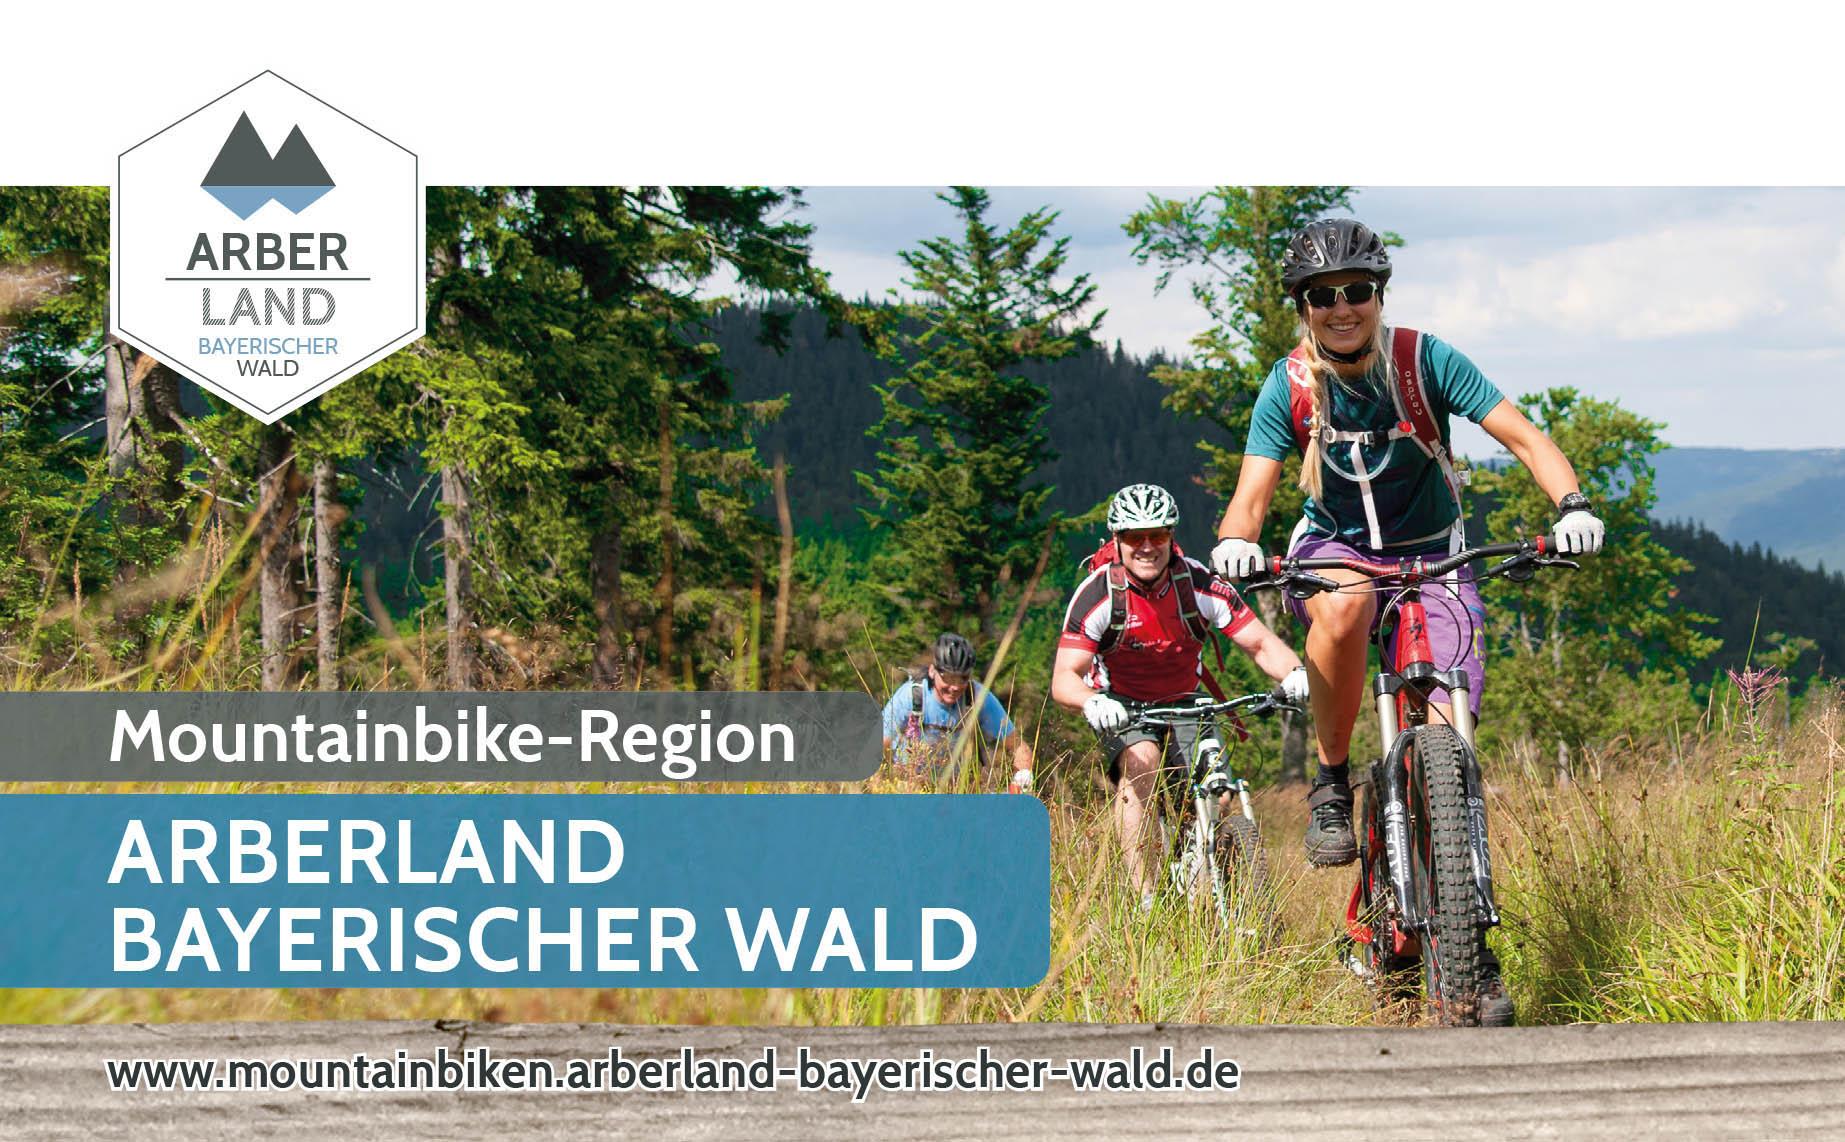 Mountainbike-Karte ARBERLAND. Foto: ARBERLAND REGio GmbH.